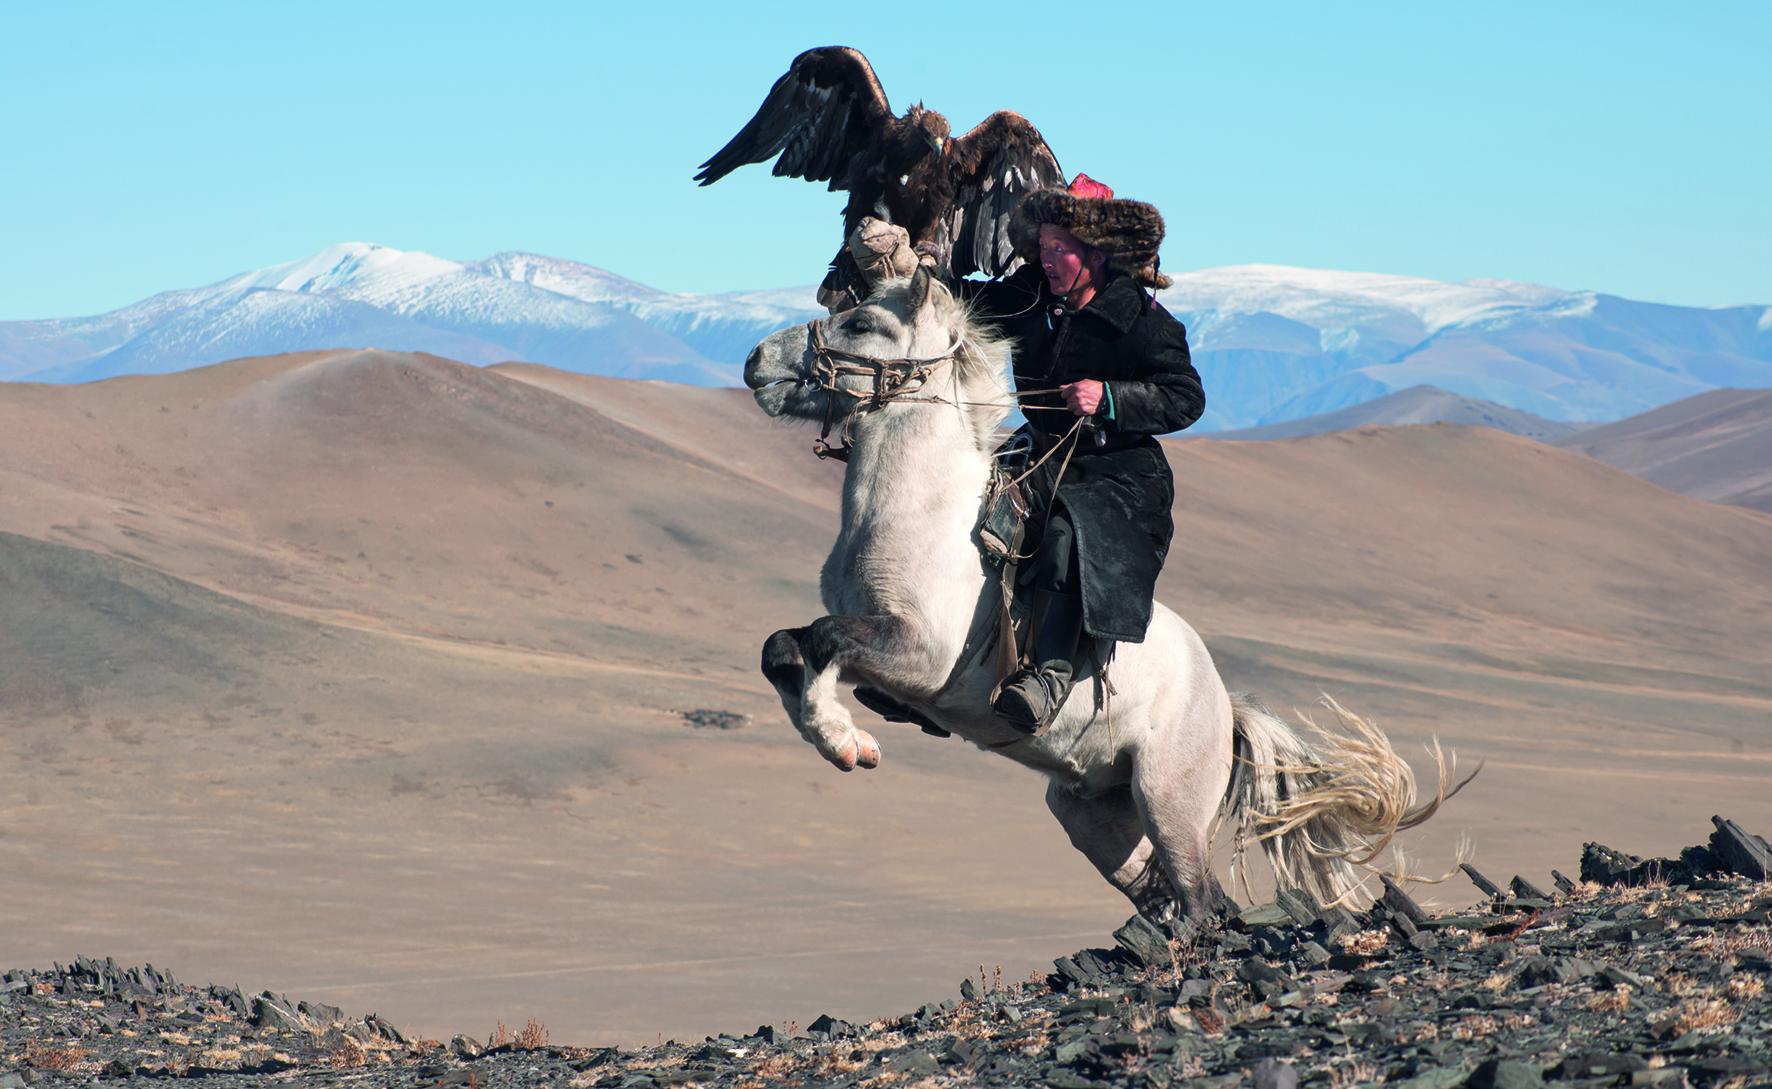 White Pegasus study I, Deloun Highlands, Olgii Province, Mongolia, 2010   Photo © 2016 Hamid Sardar. All rights reserved.  www.hamidsardarphoto.com